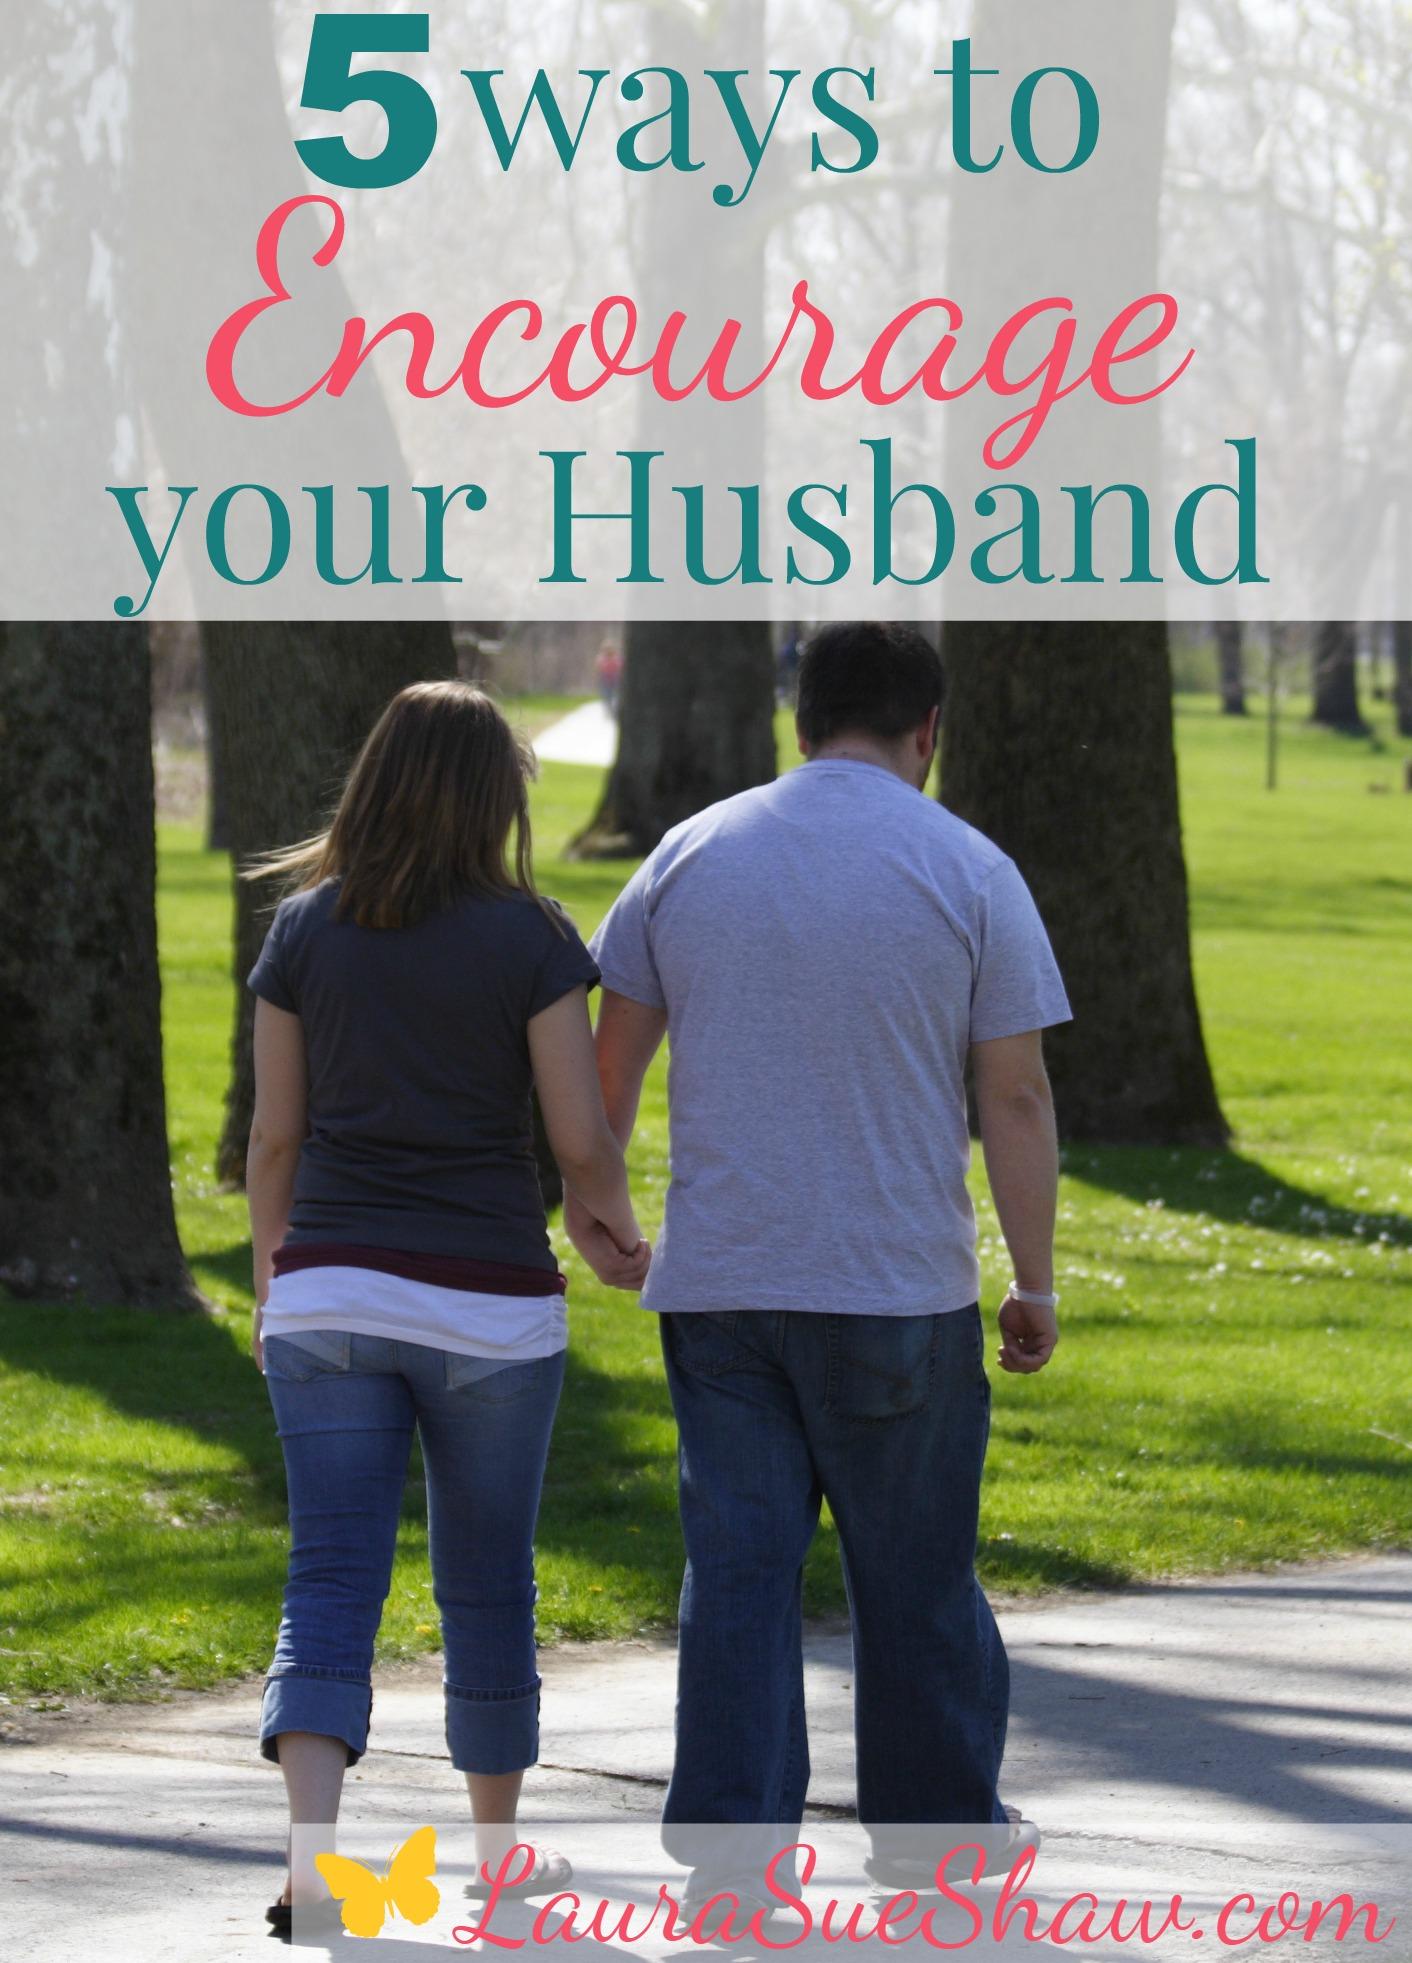 5 Ways to Encourage Your Husband